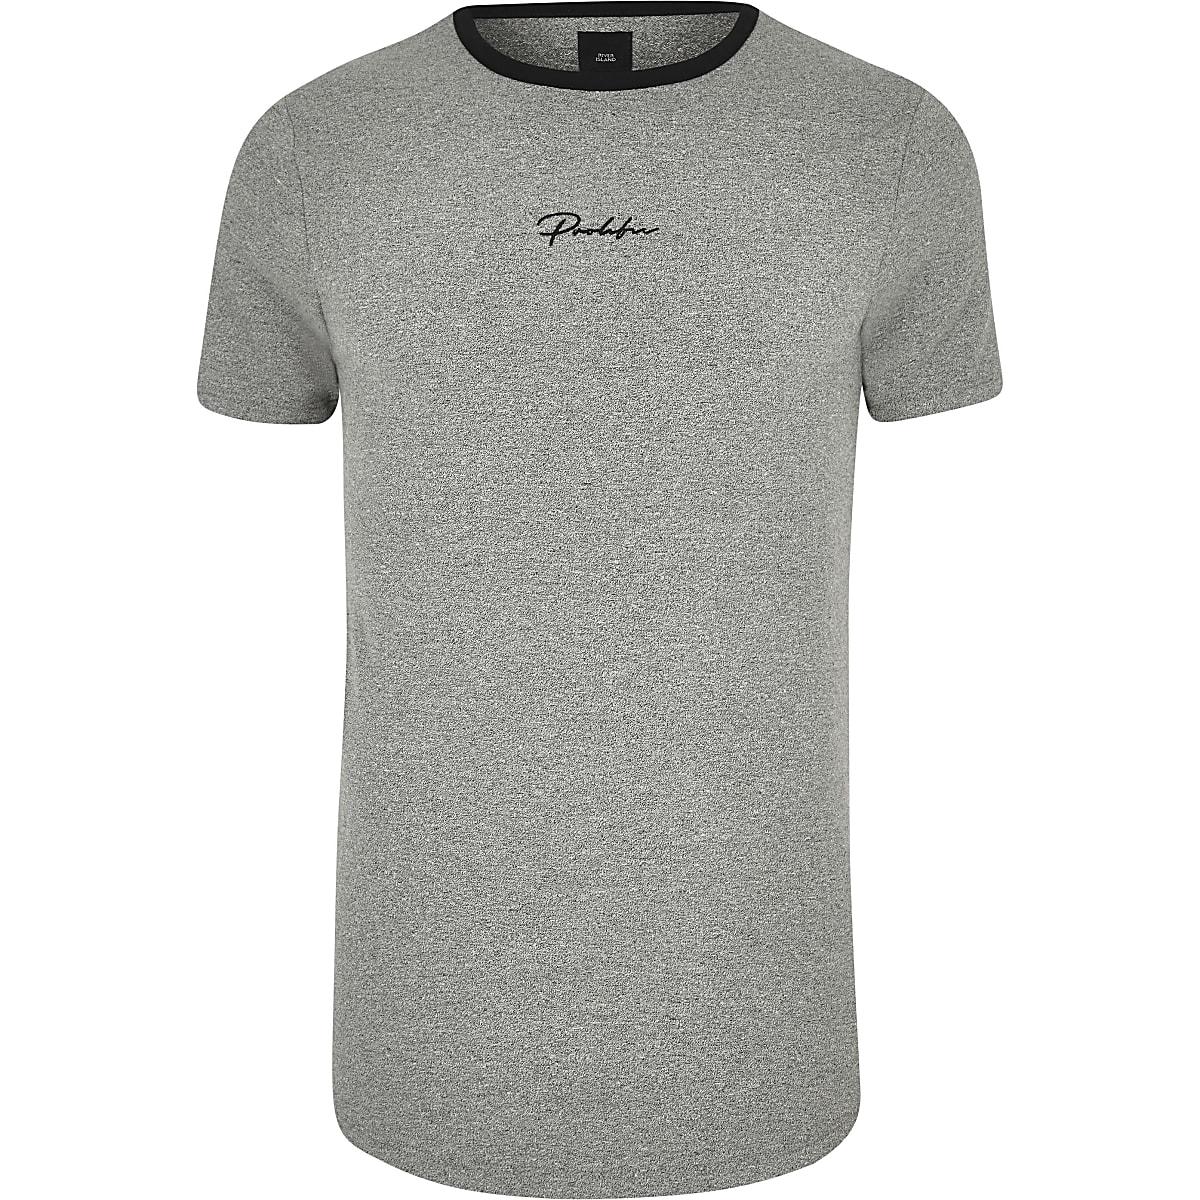 Big and Tall - Grijs T-shirt met ronde zoom en 'Prolific'-print